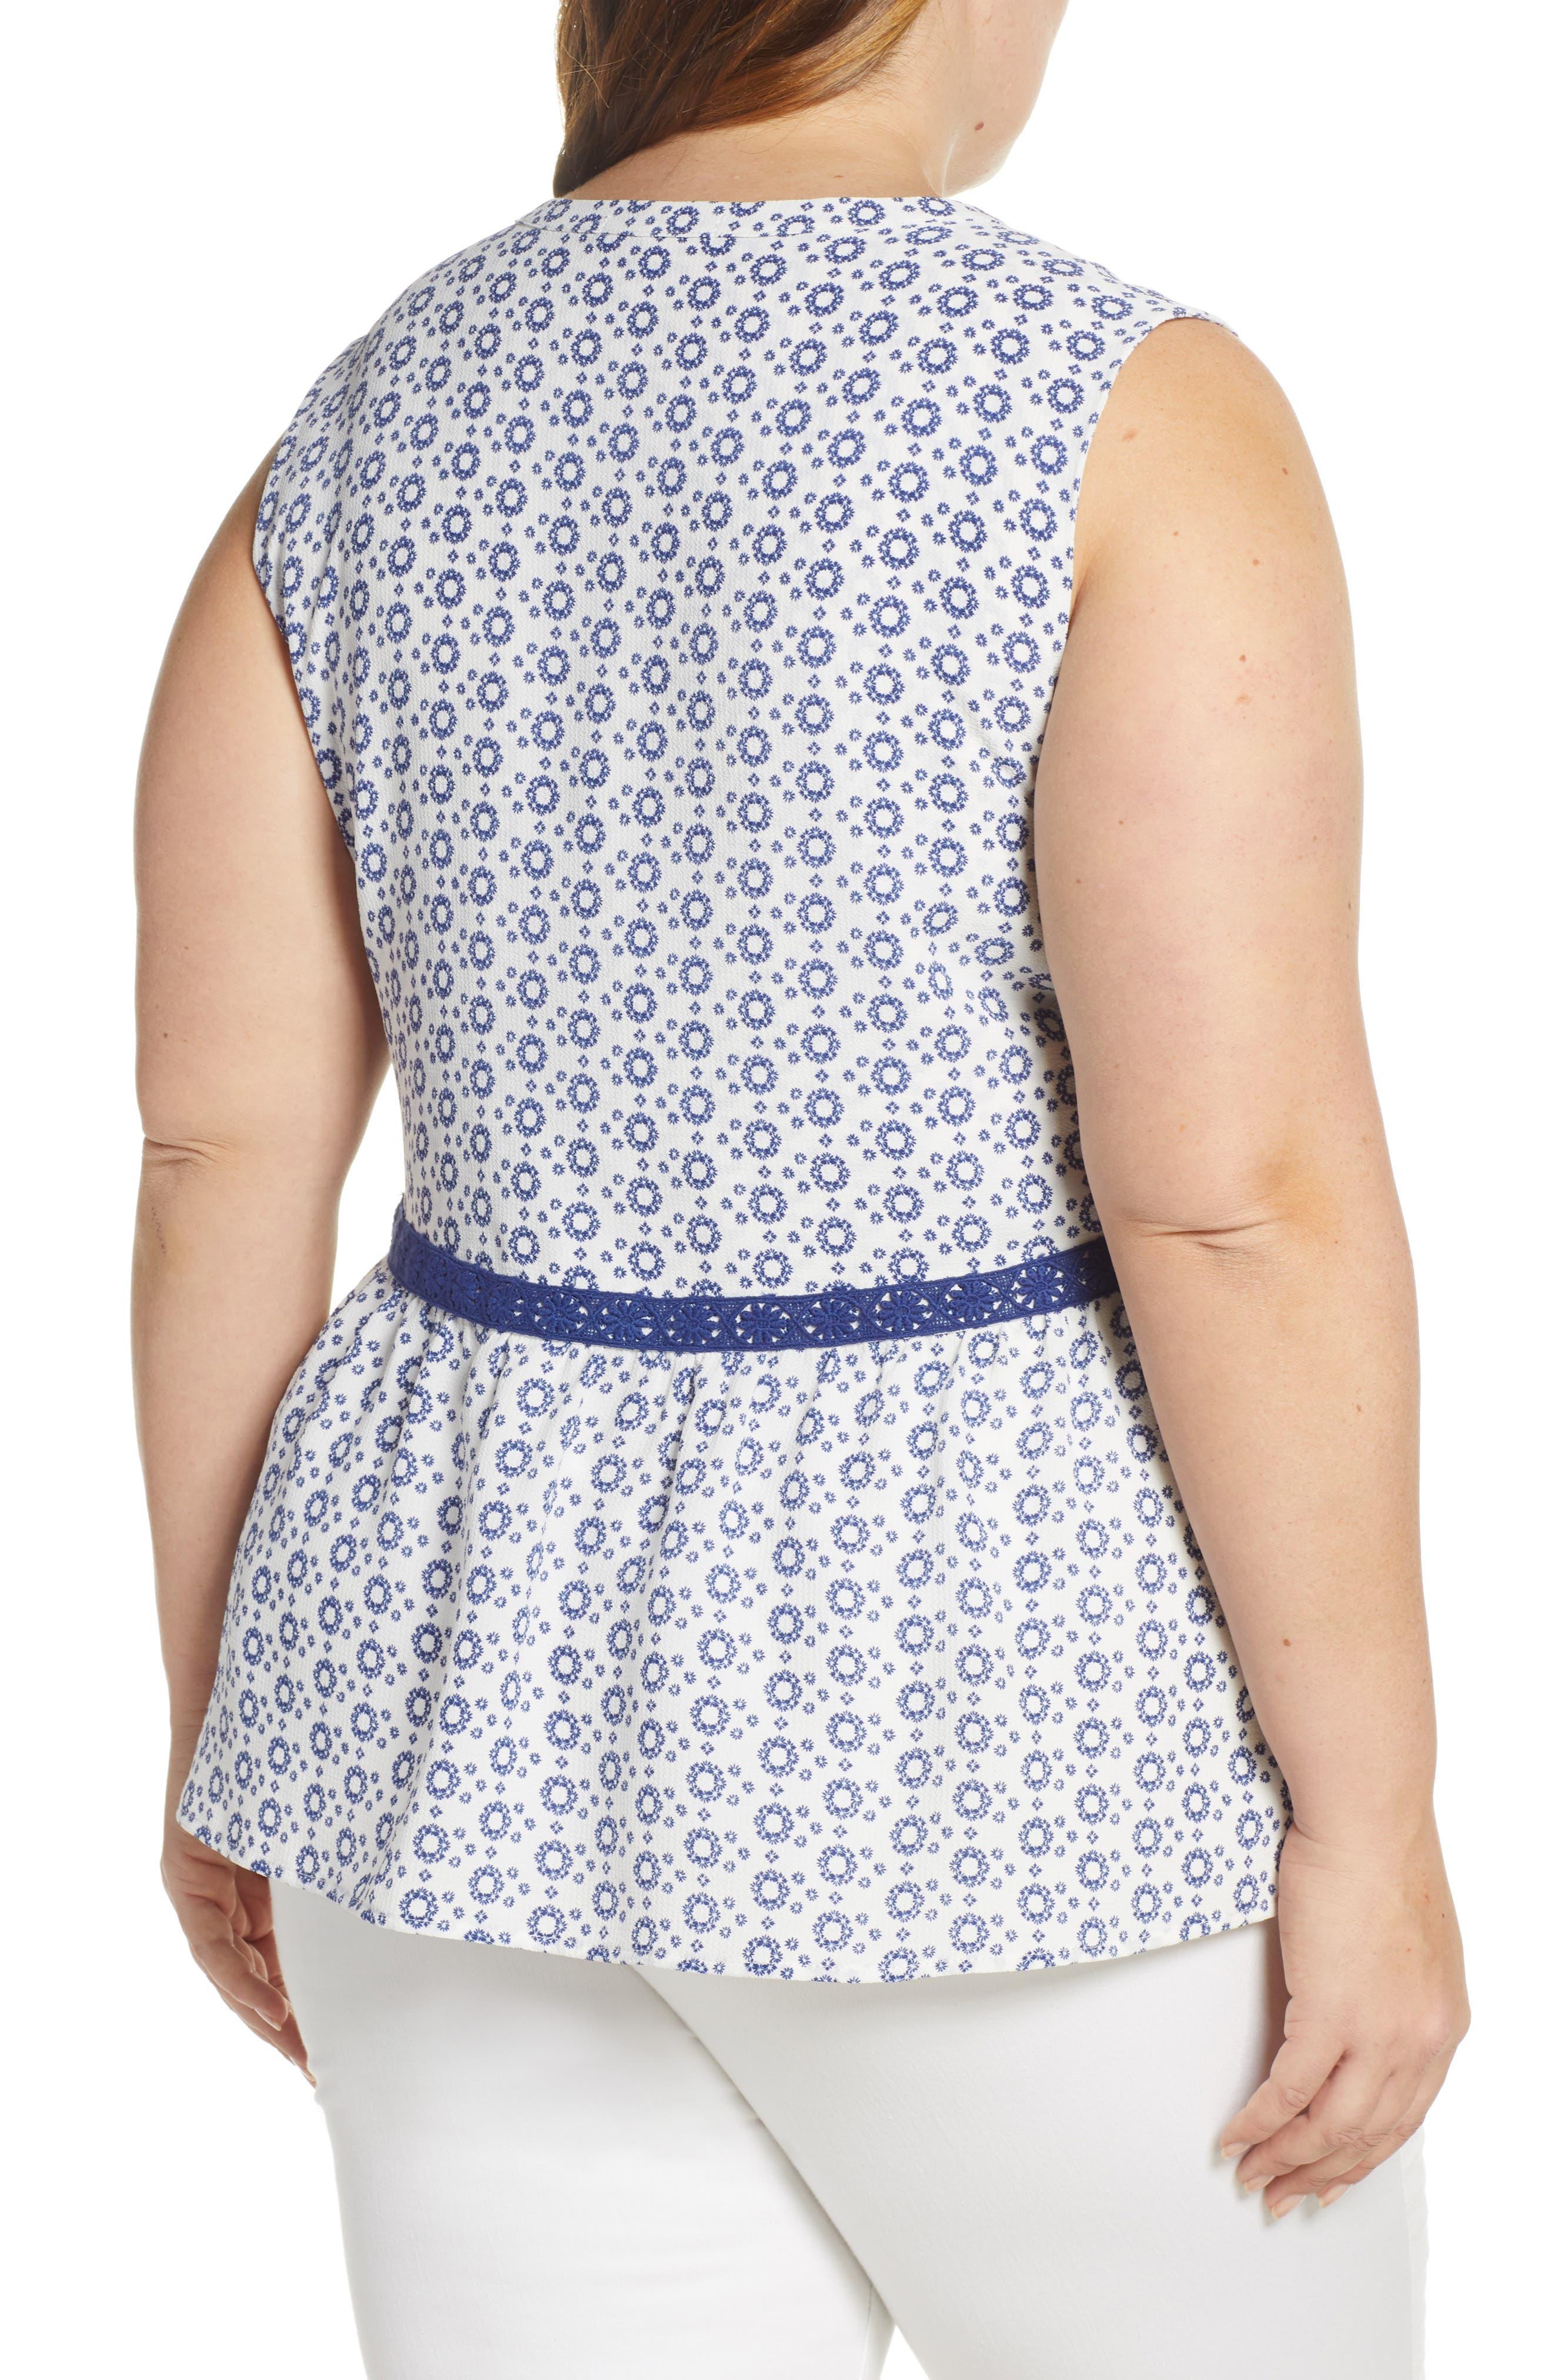 GIBSON, x International Women's Day Lindsey Crochet Detail Babydoll Blouse, Alternate thumbnail 2, color, WHITE/ NAVY GEO